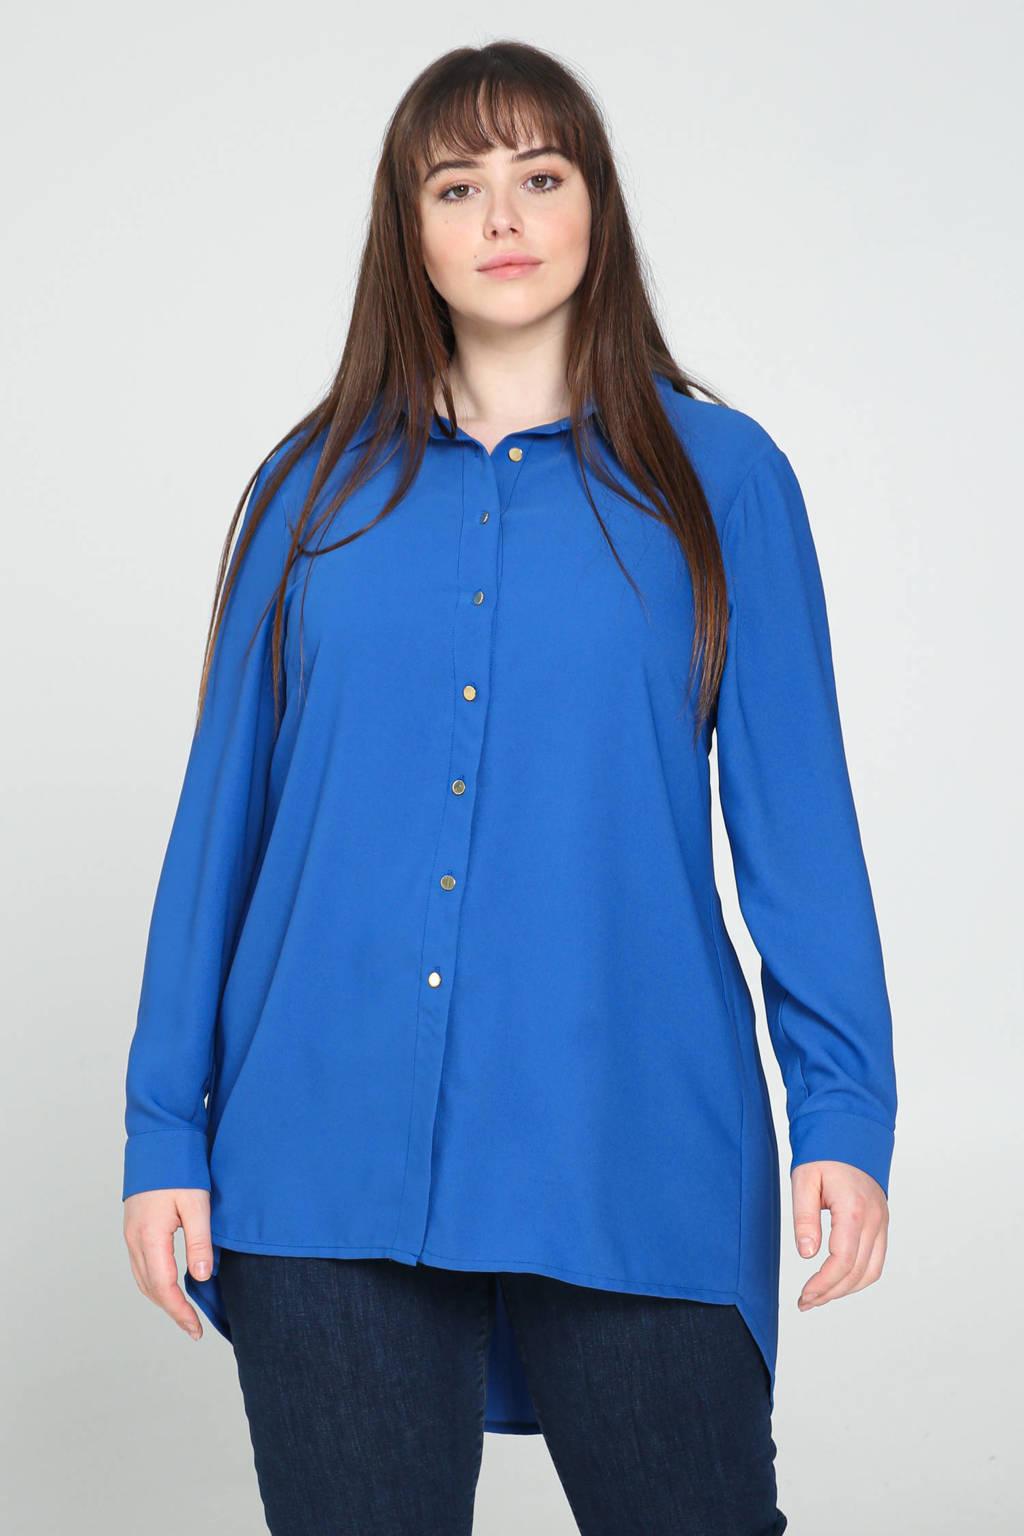 PROMISS tuniekblouse blauw, Bleu royal